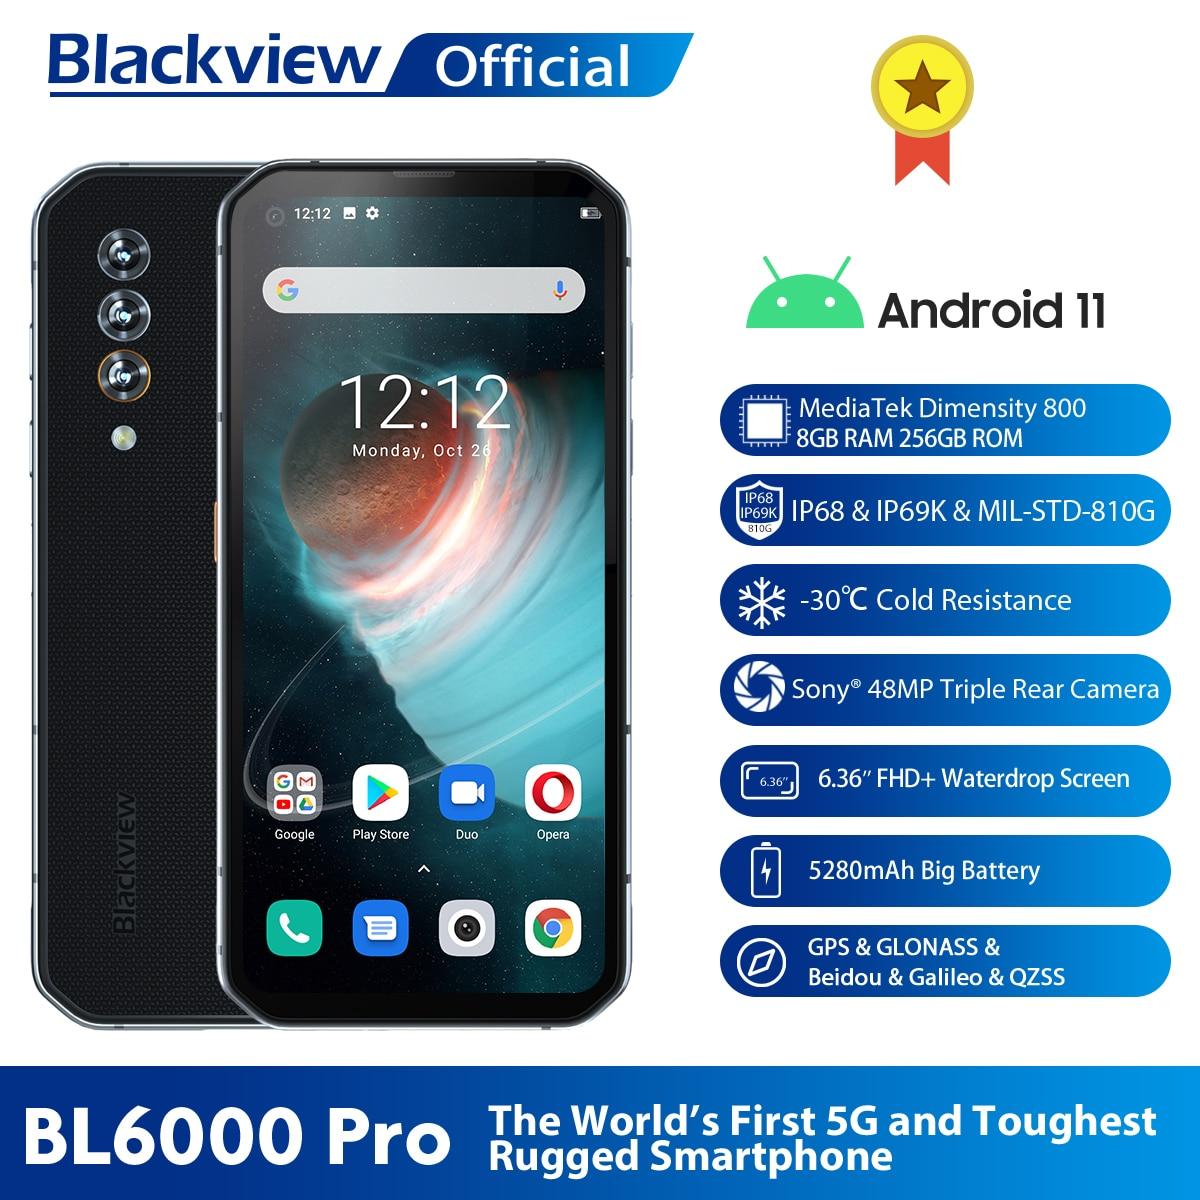 Blackview BL6000 برو 5G الهاتف الذكي IP68 مقاوم للماء 48MP الثلاثي كاميرا 8GB RAM 256GB ROM 6.36 بوصة النسخة العالمية الهواتف المحمولة